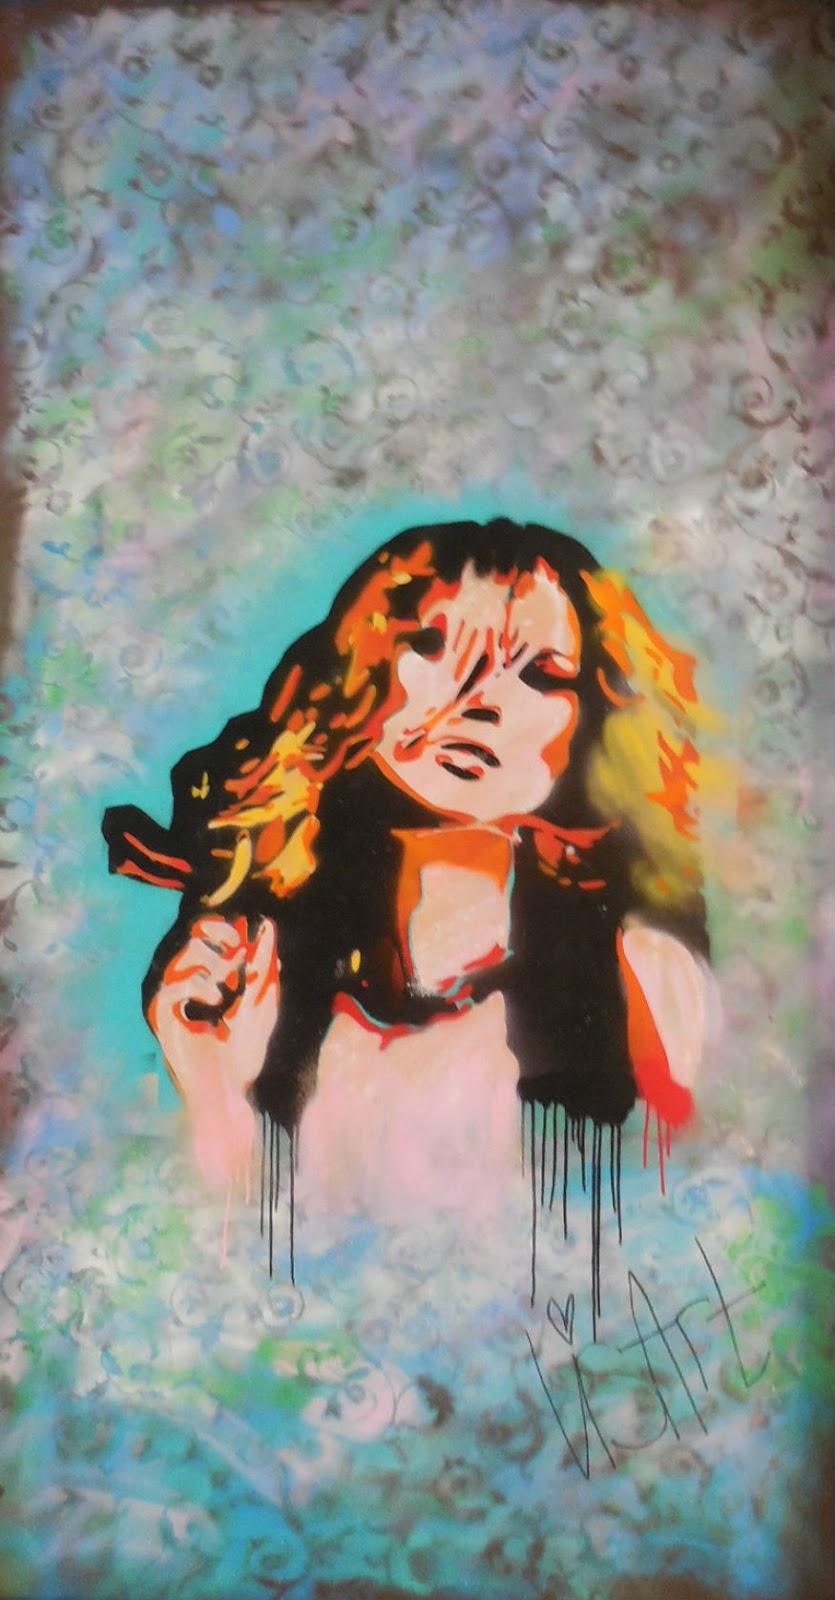 Femme Fierce take over croydon street art